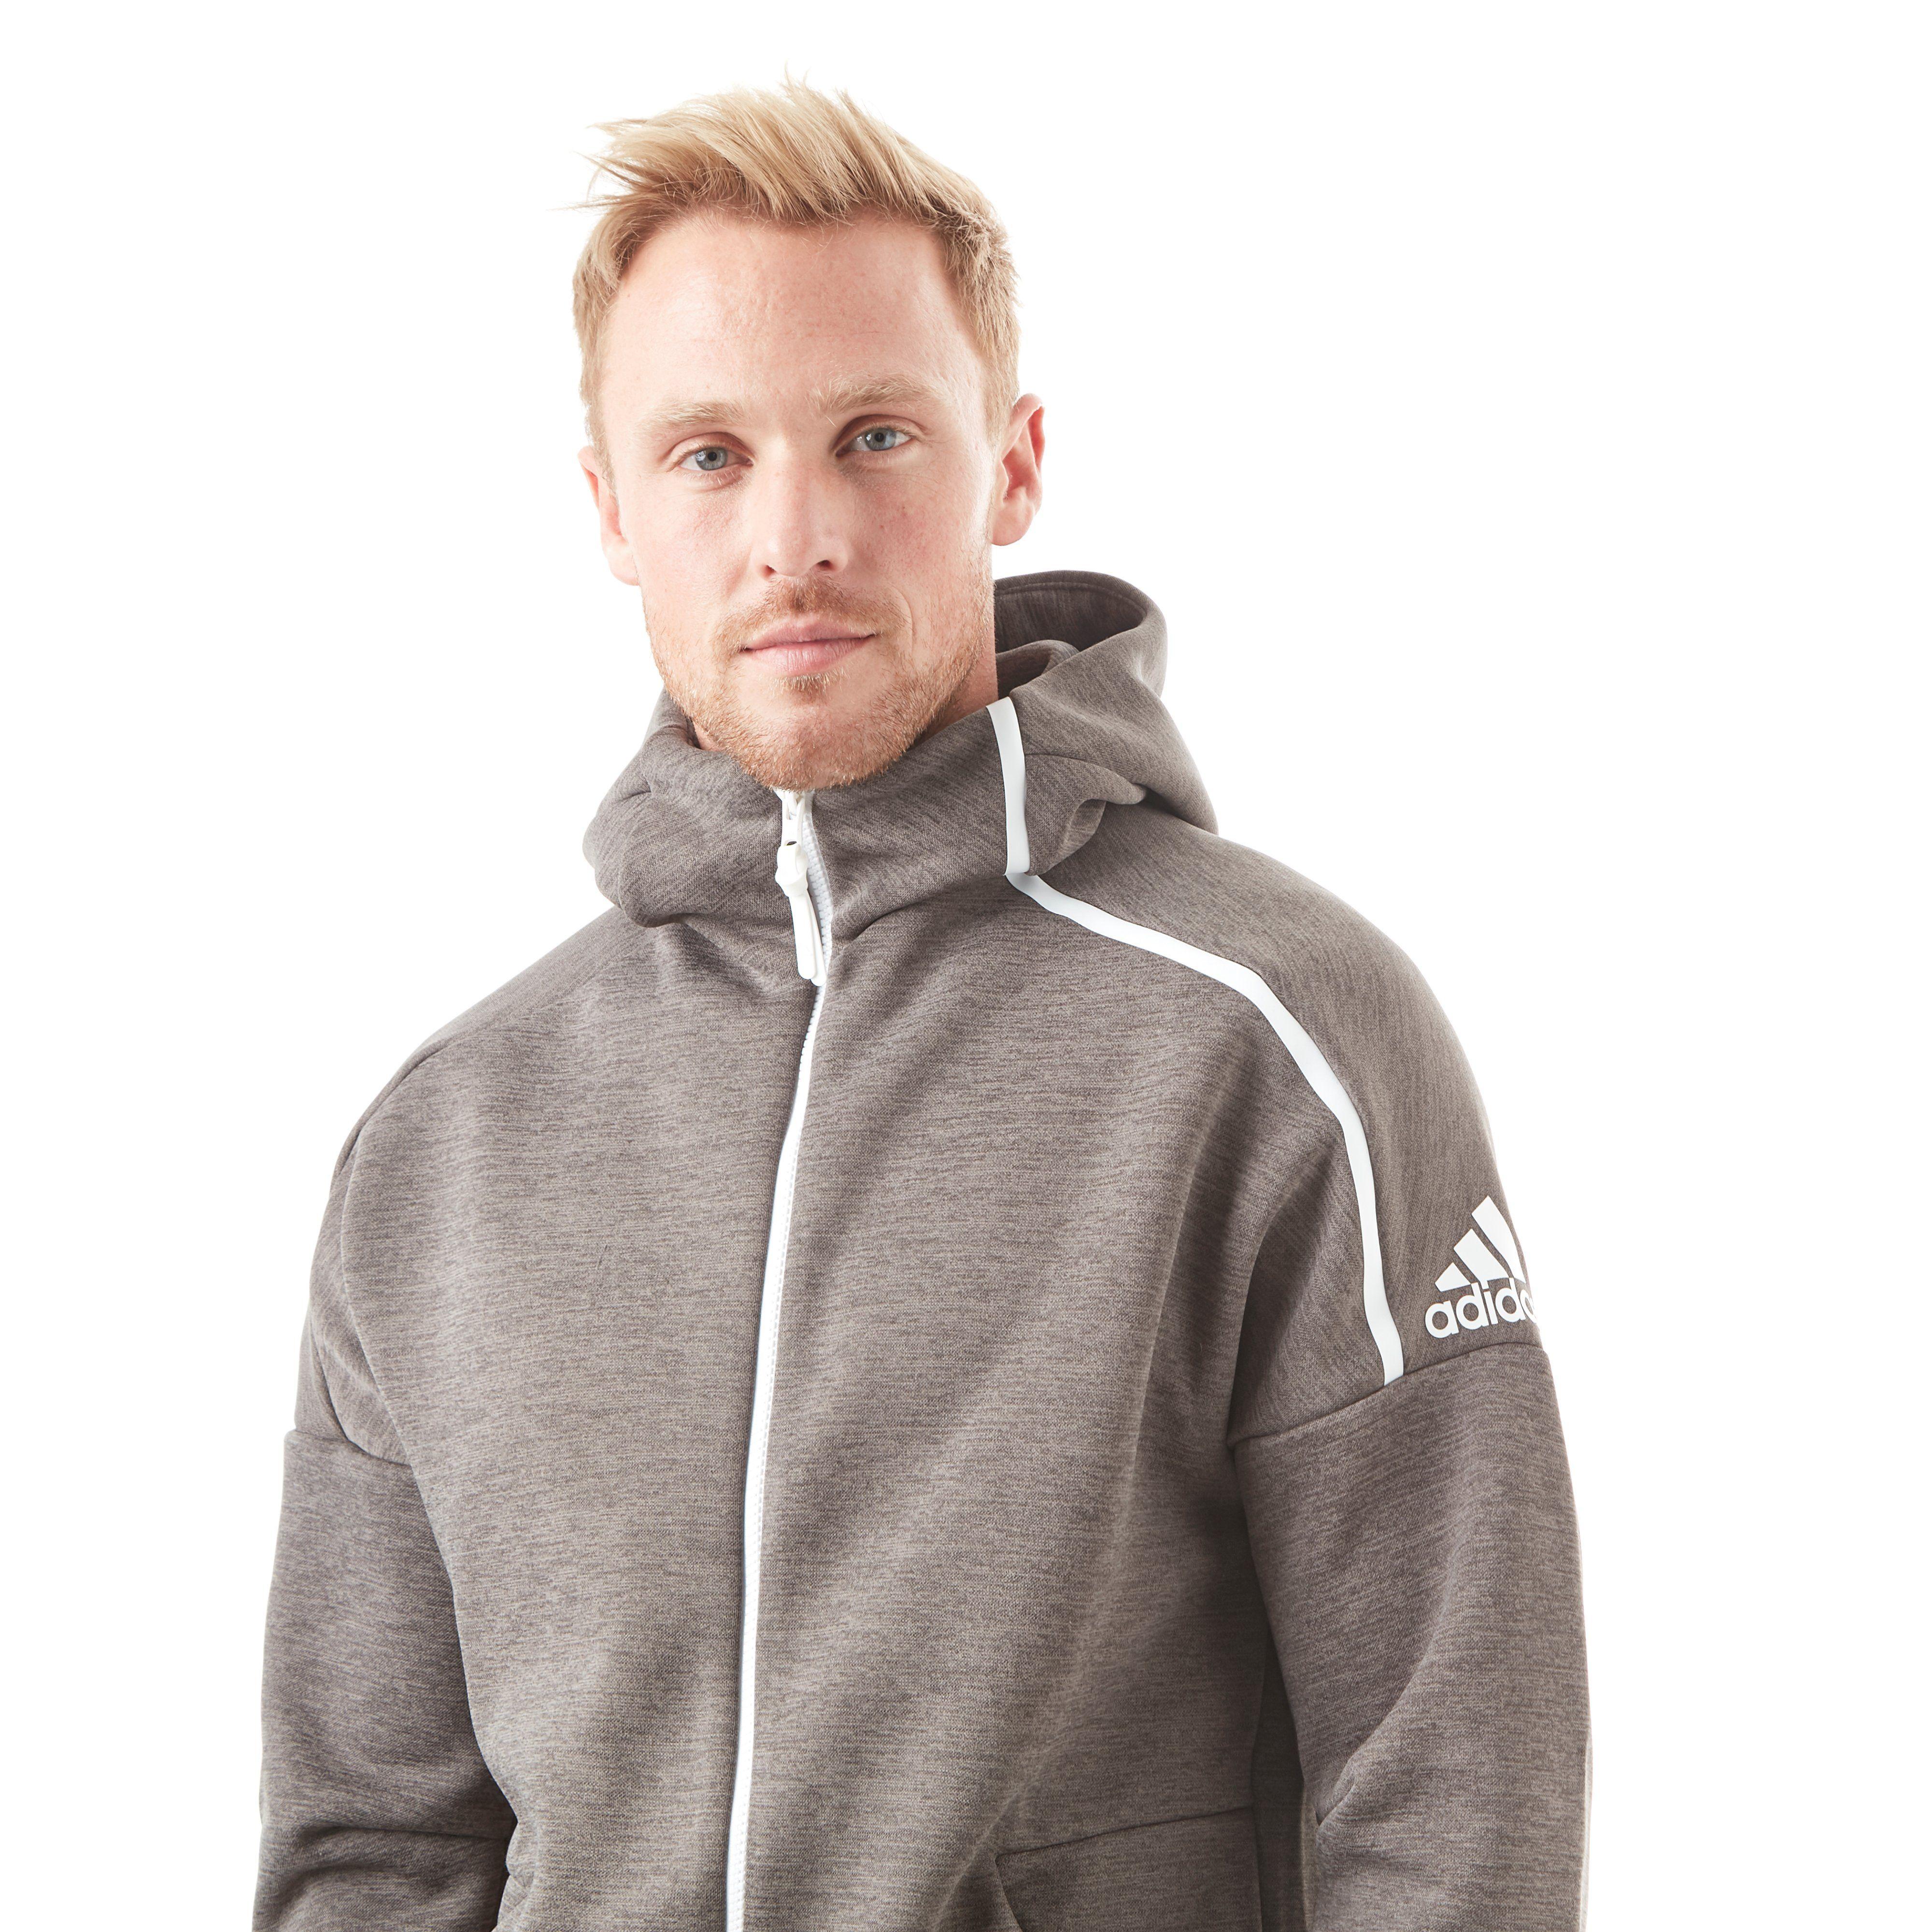 adidas Z.N.E Men's Tennis Hooded Jacket